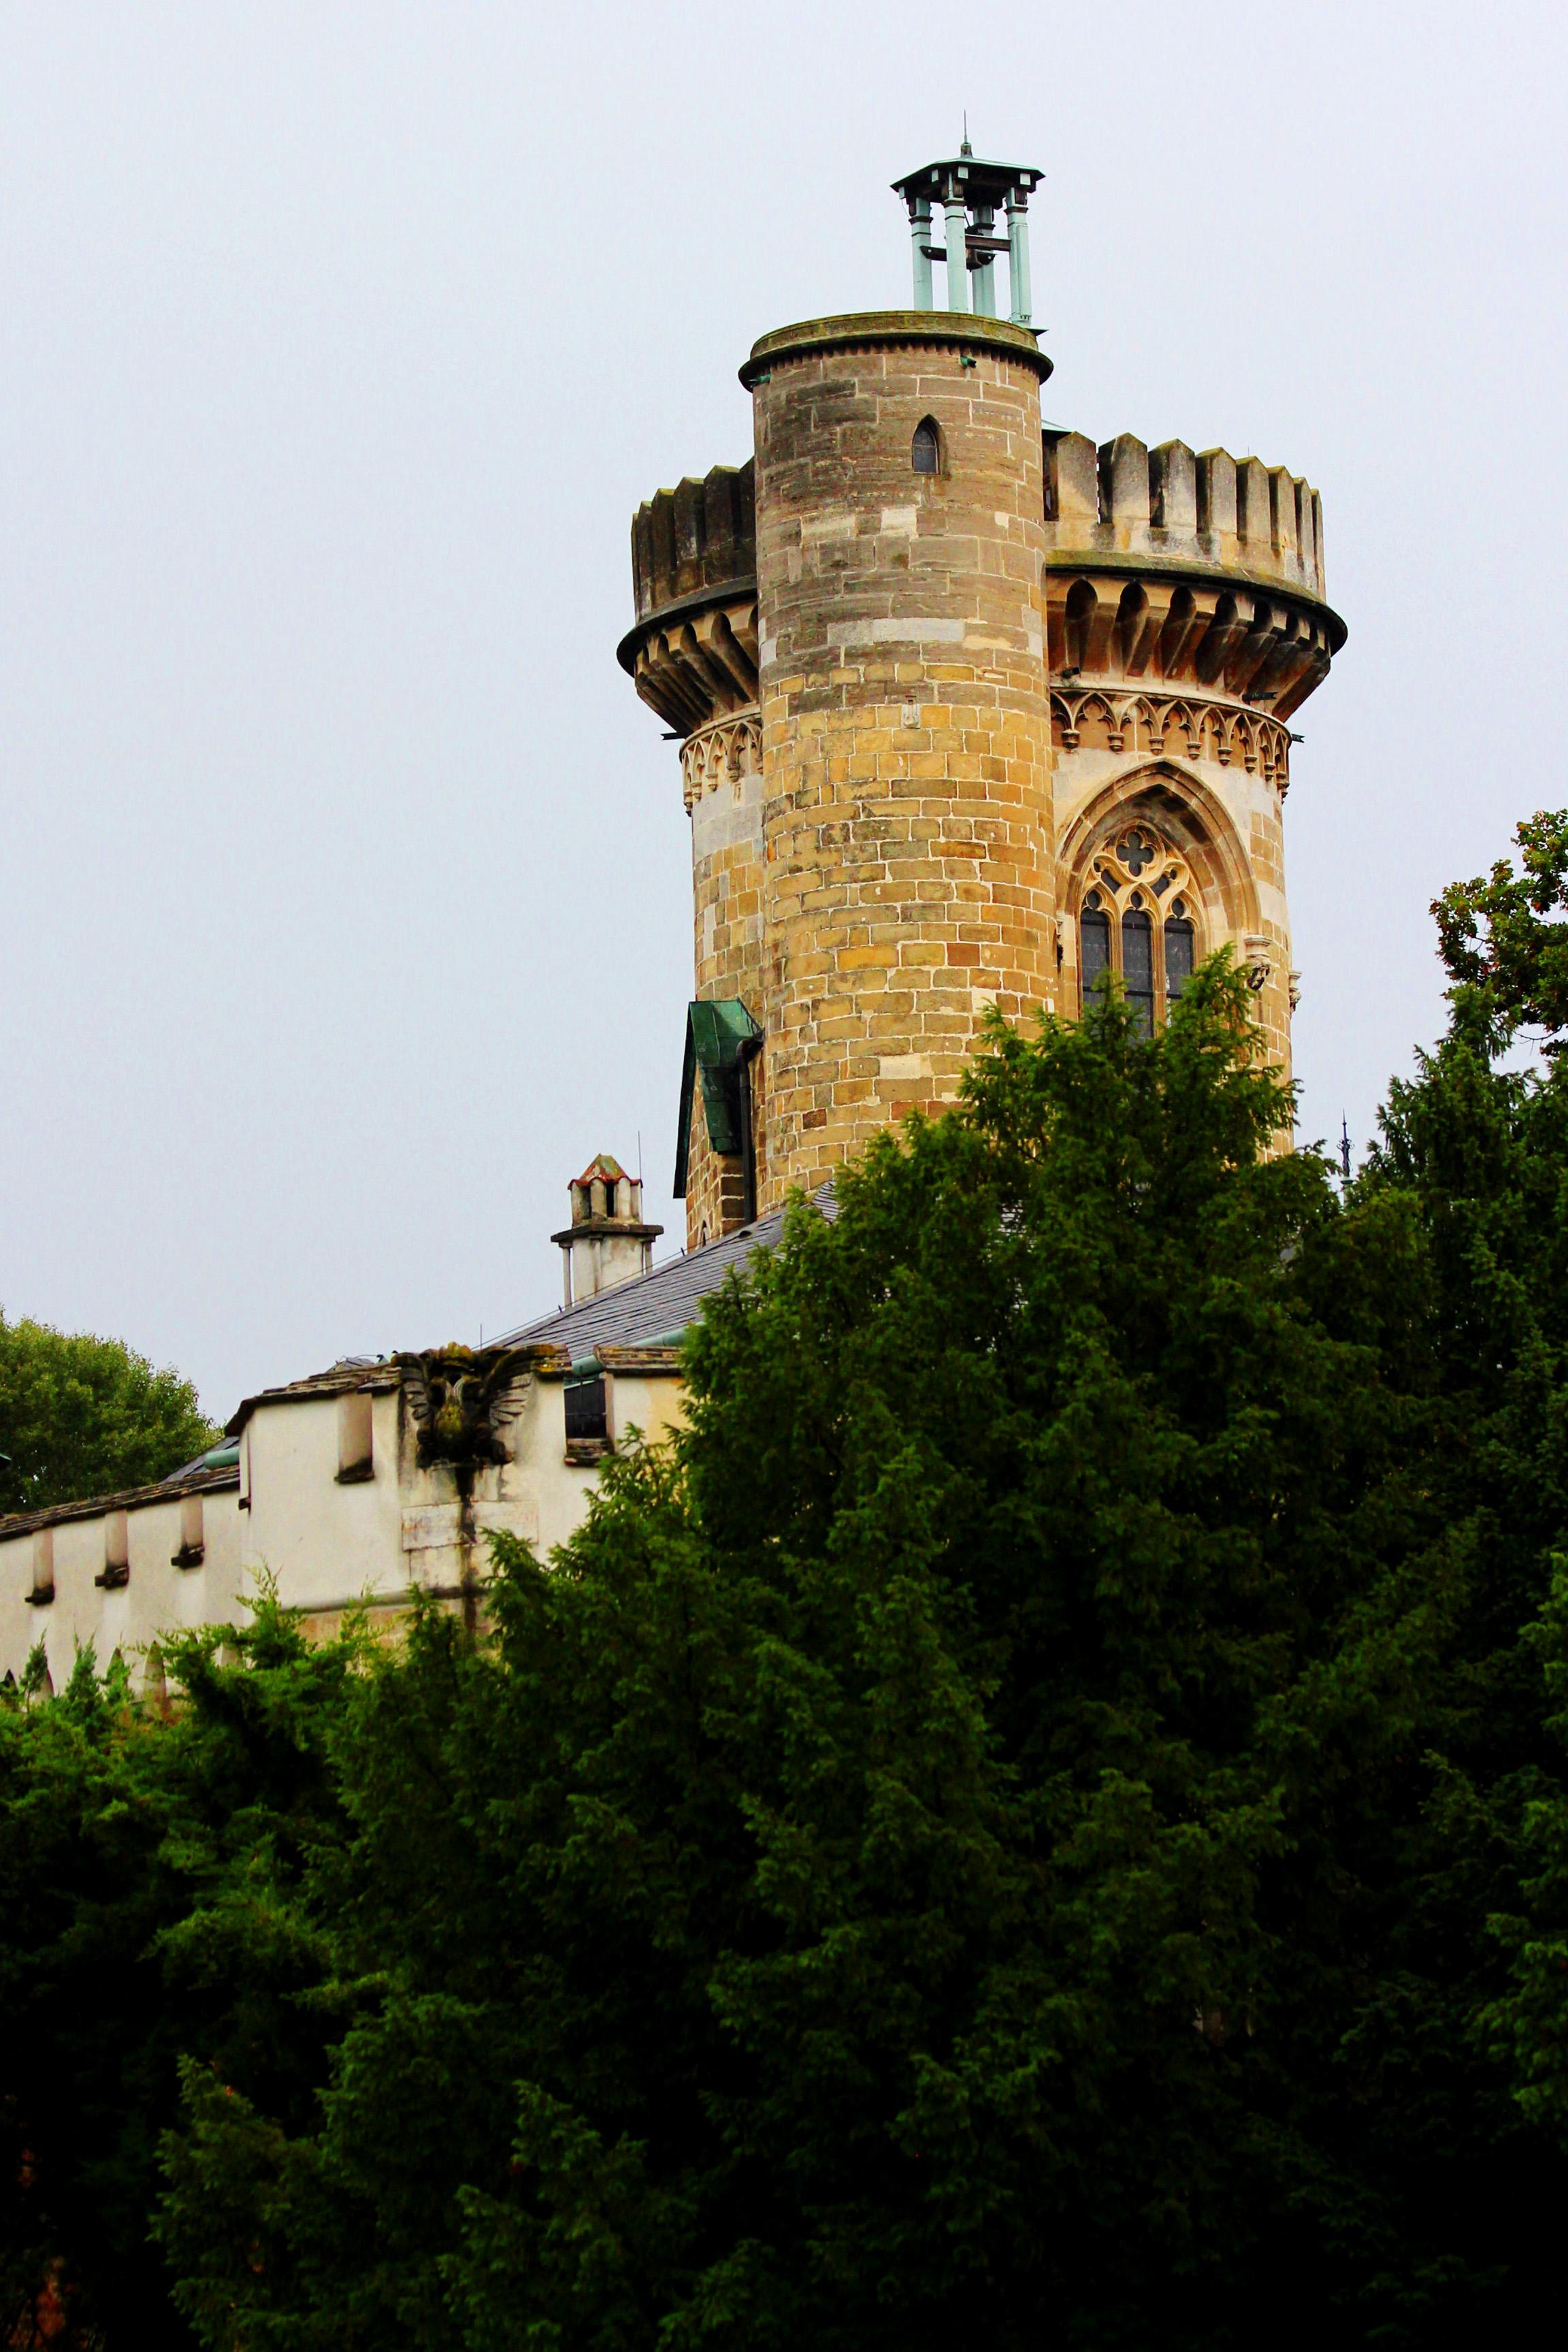 Franzensburgi-kastély, Laxenburg